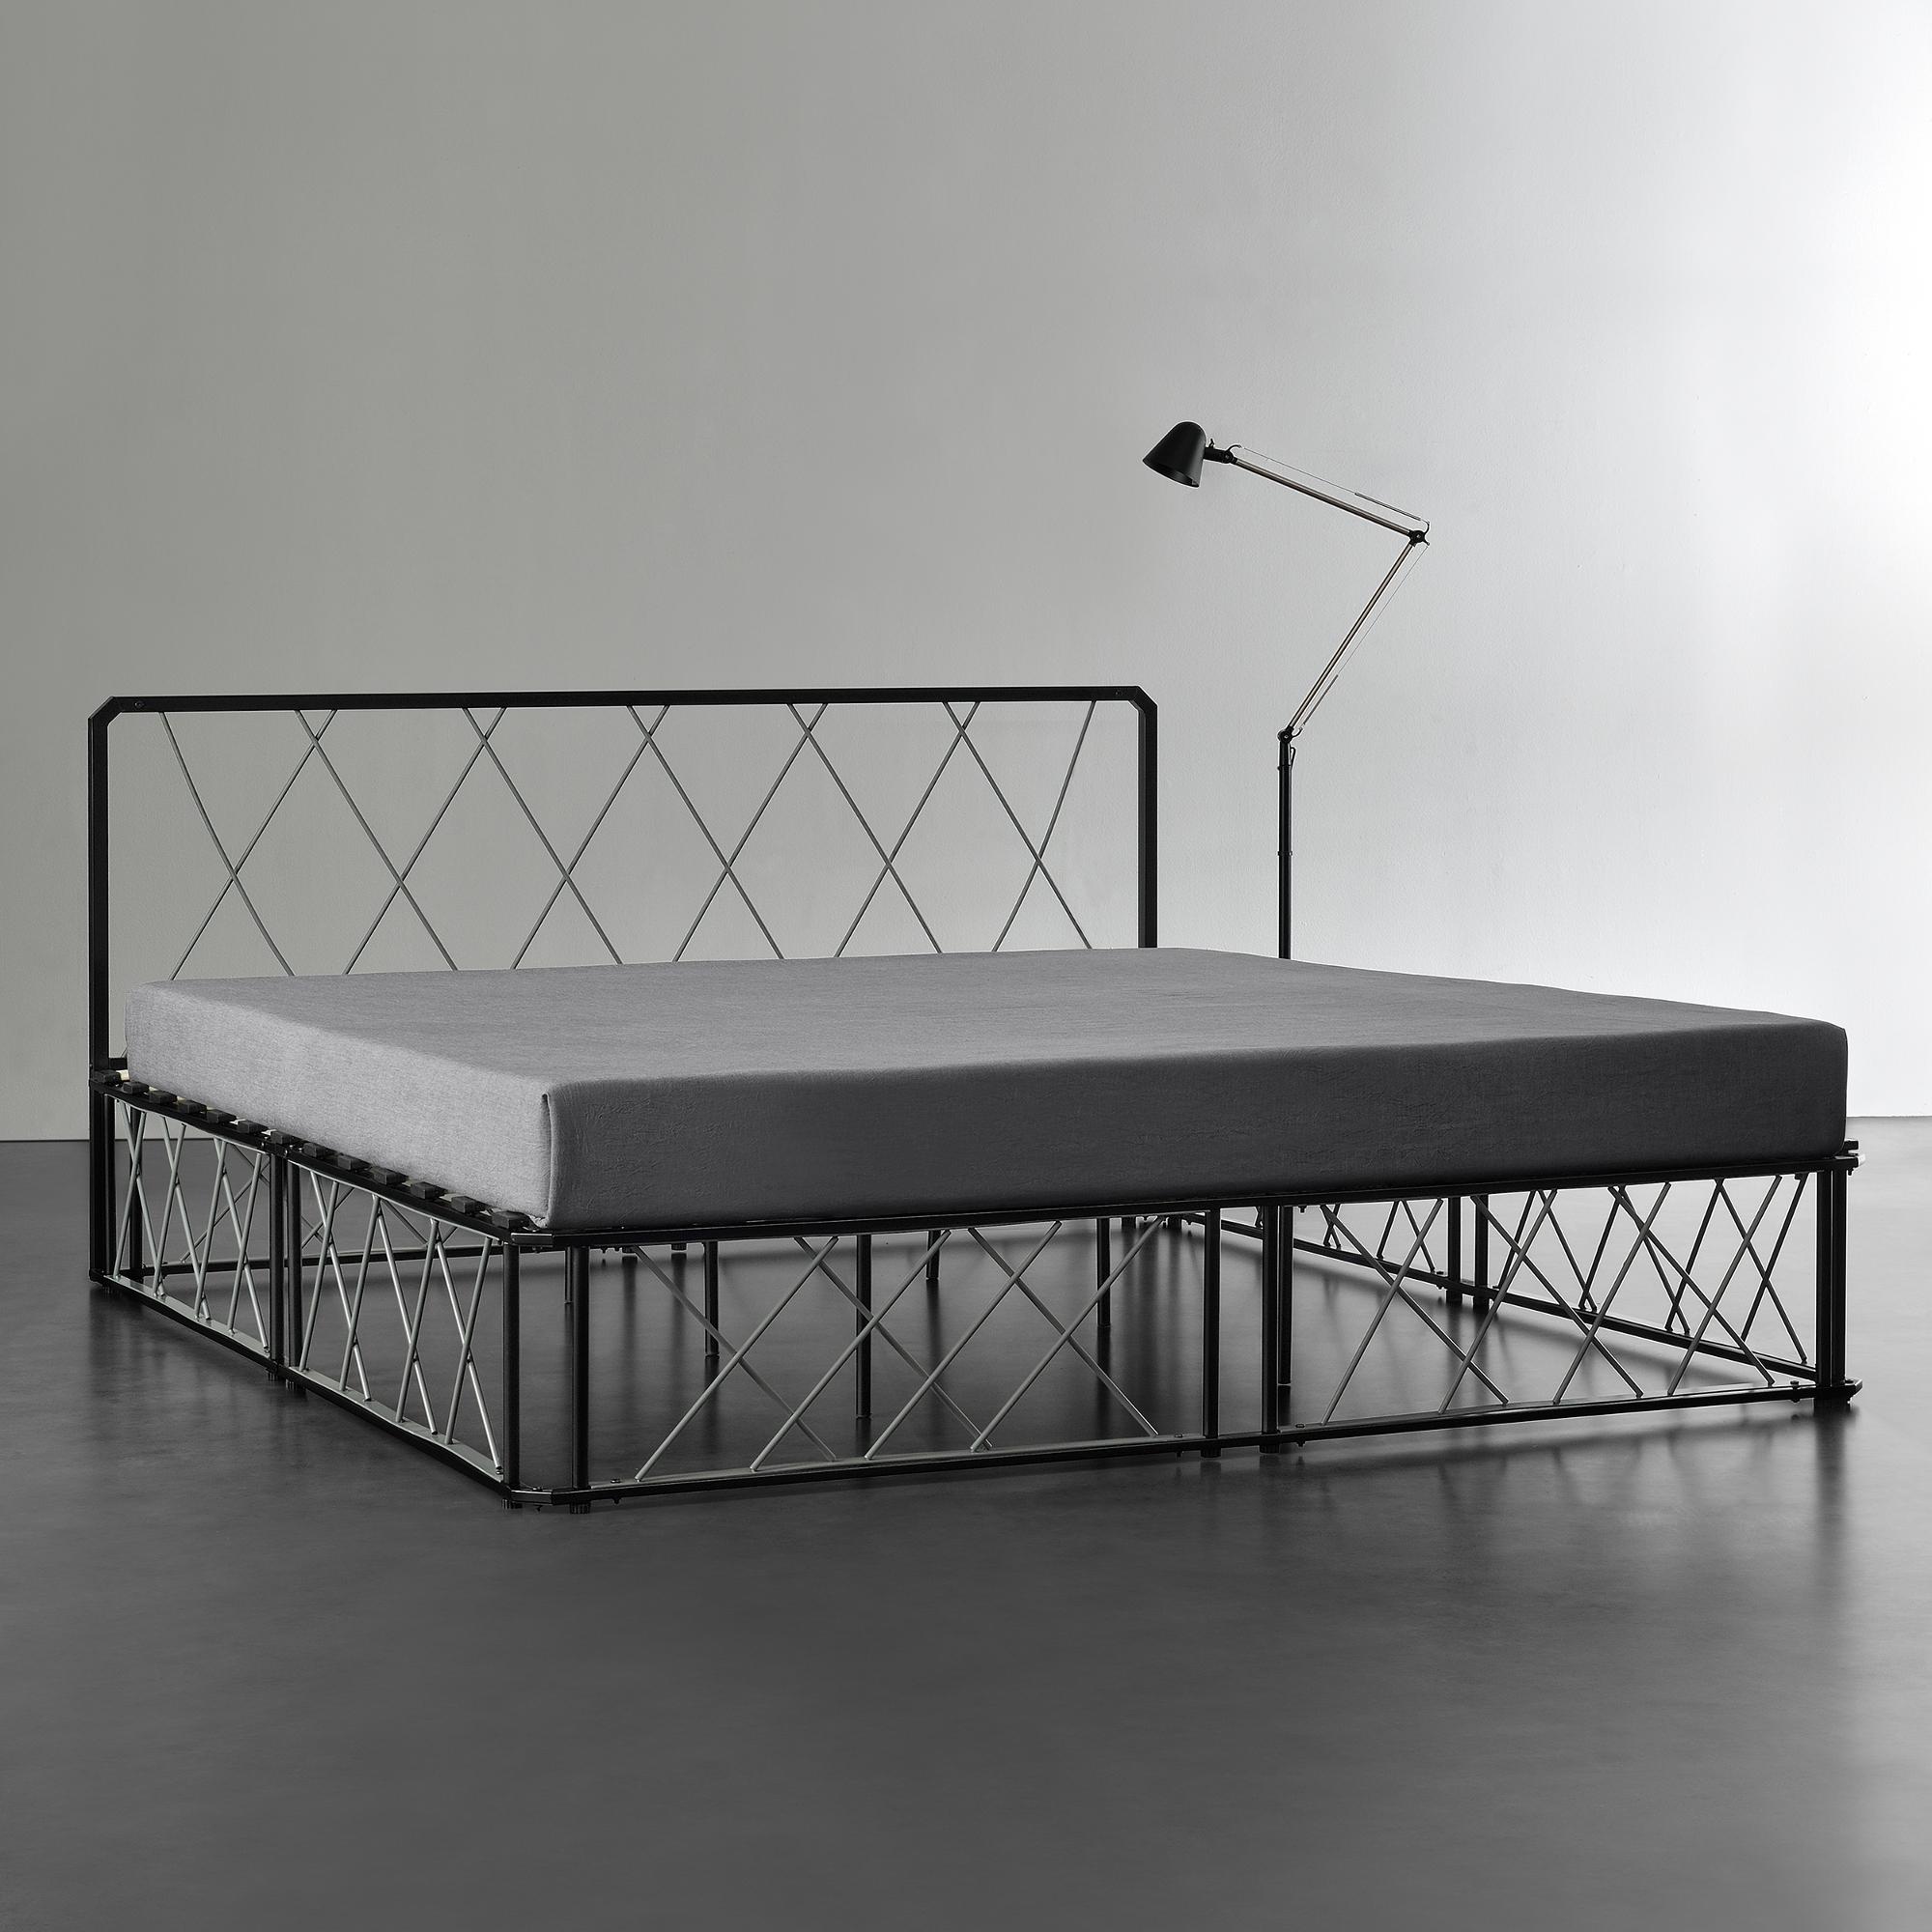 metallbett 180x200 schwarz grau bettgestell. Black Bedroom Furniture Sets. Home Design Ideas